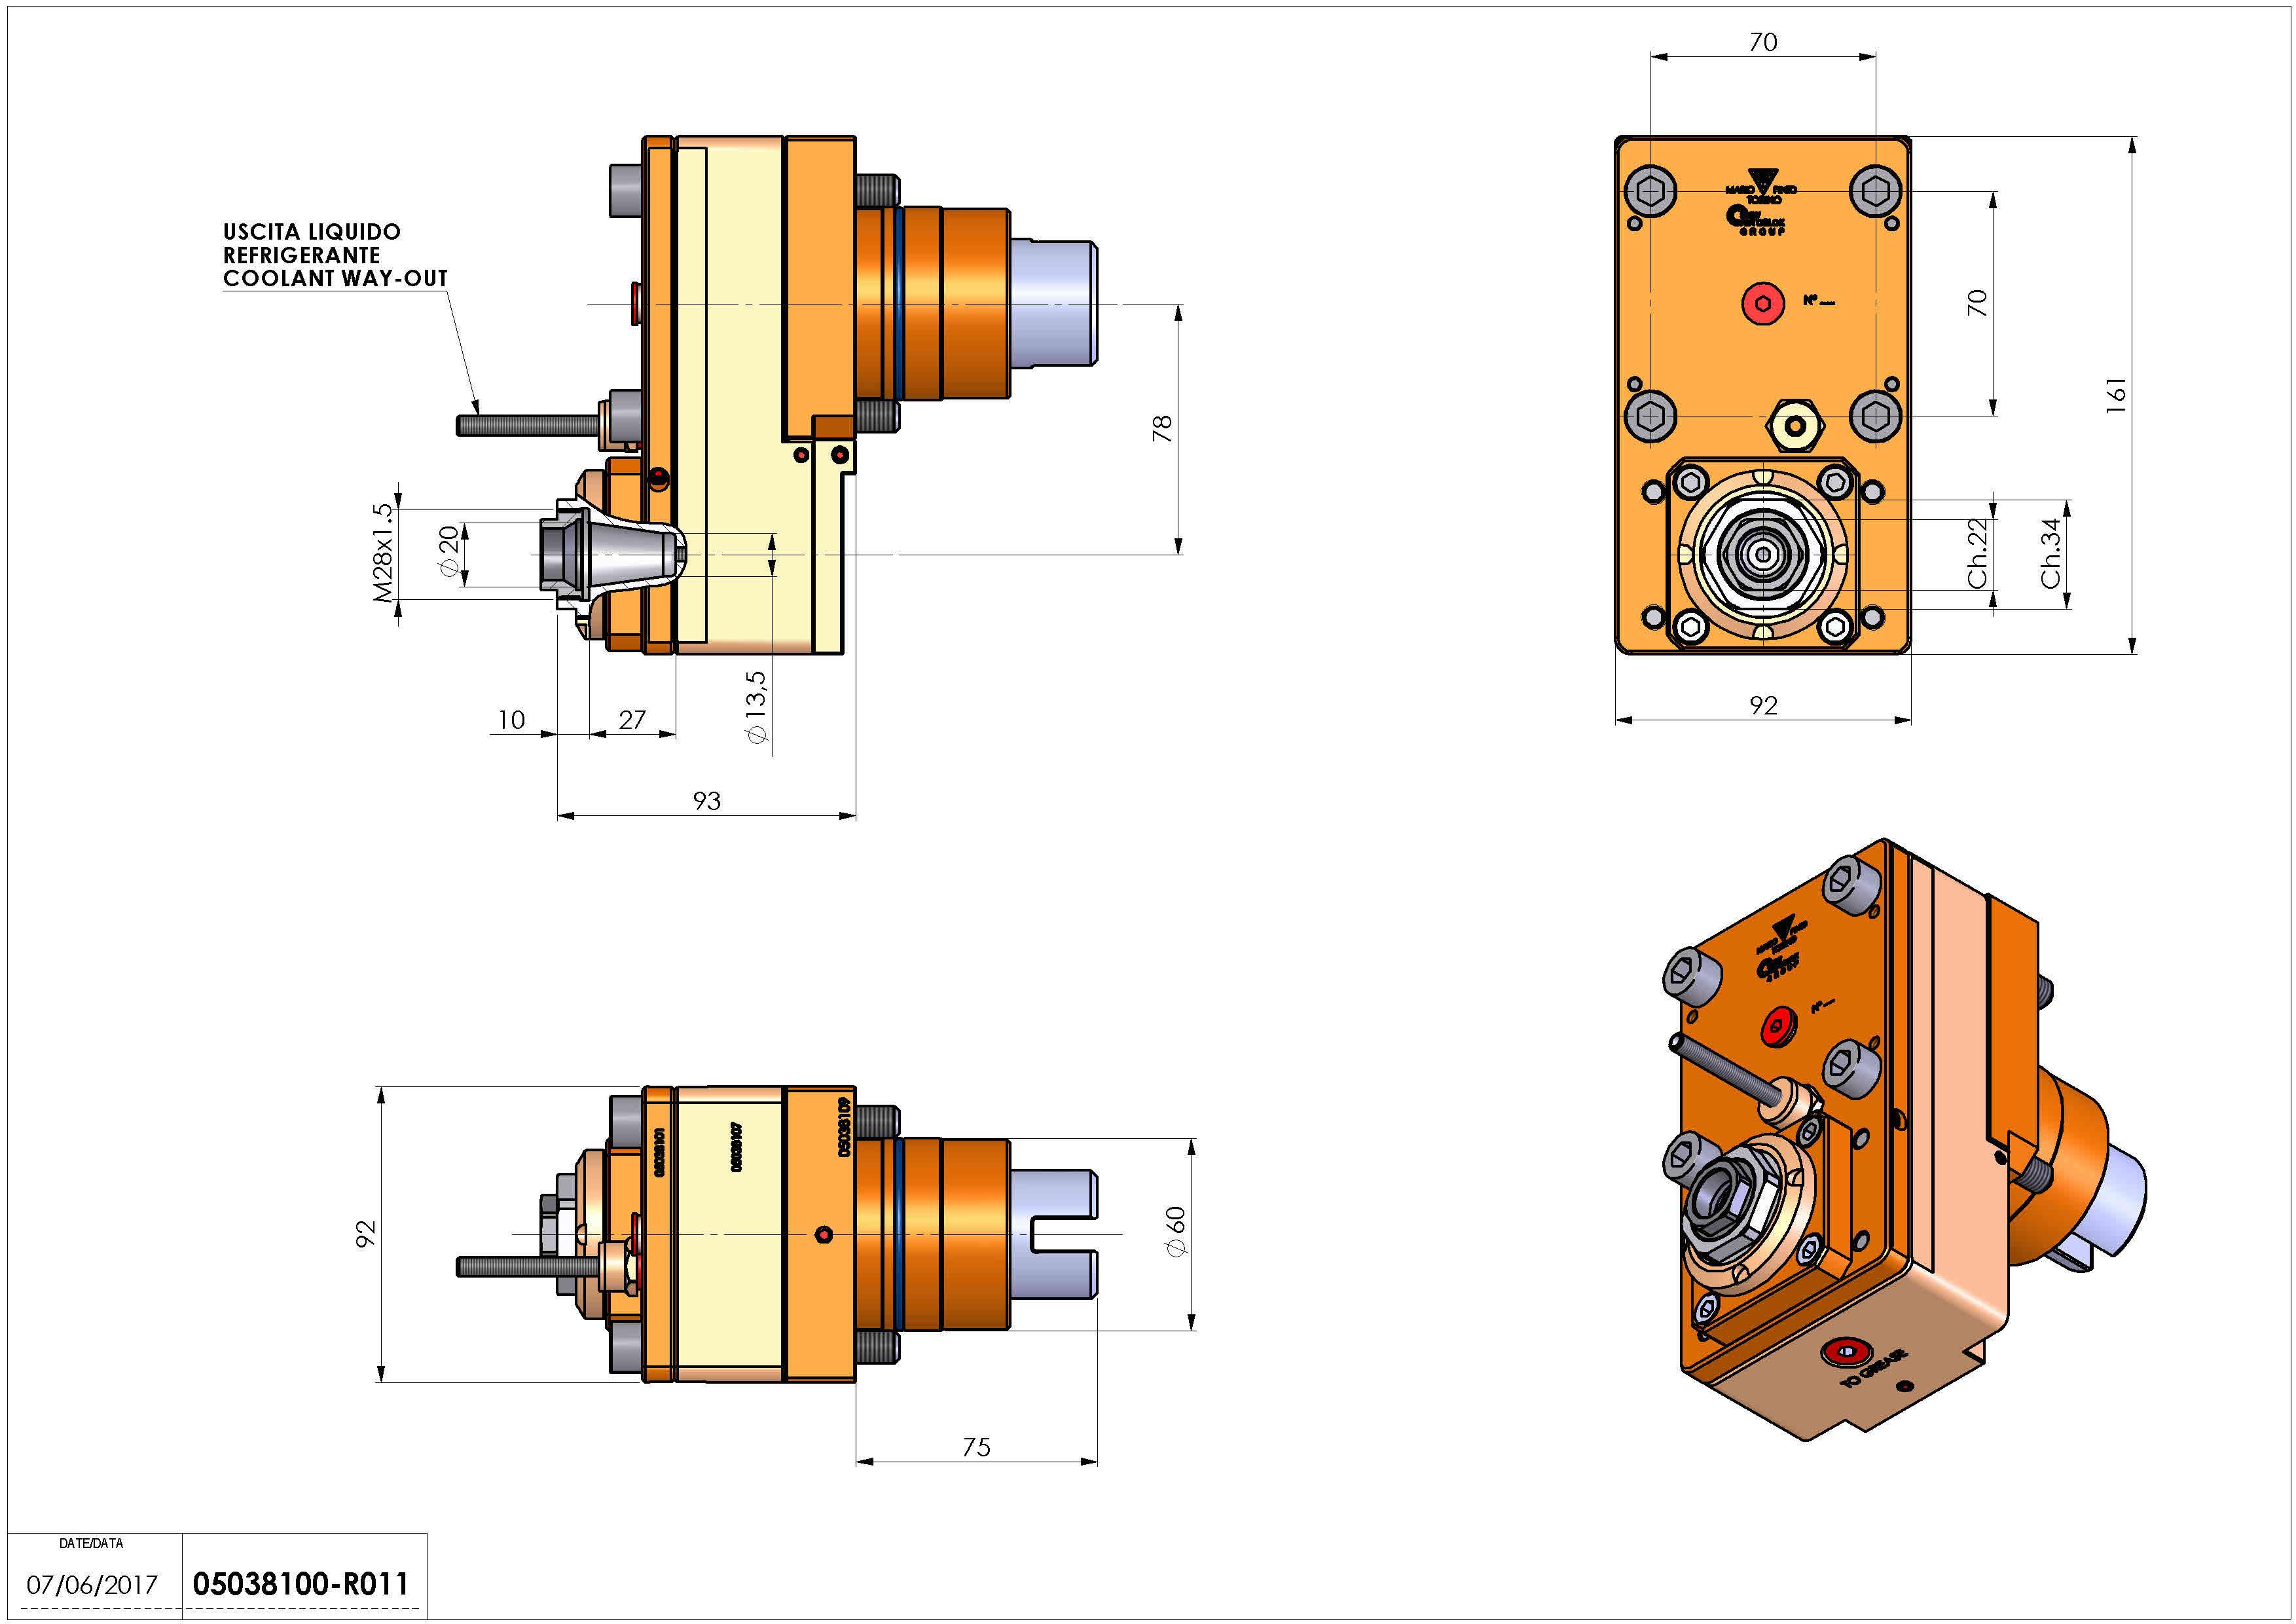 Technical image - LT-S D60 ER20F OFS78 L 1:3 H93.